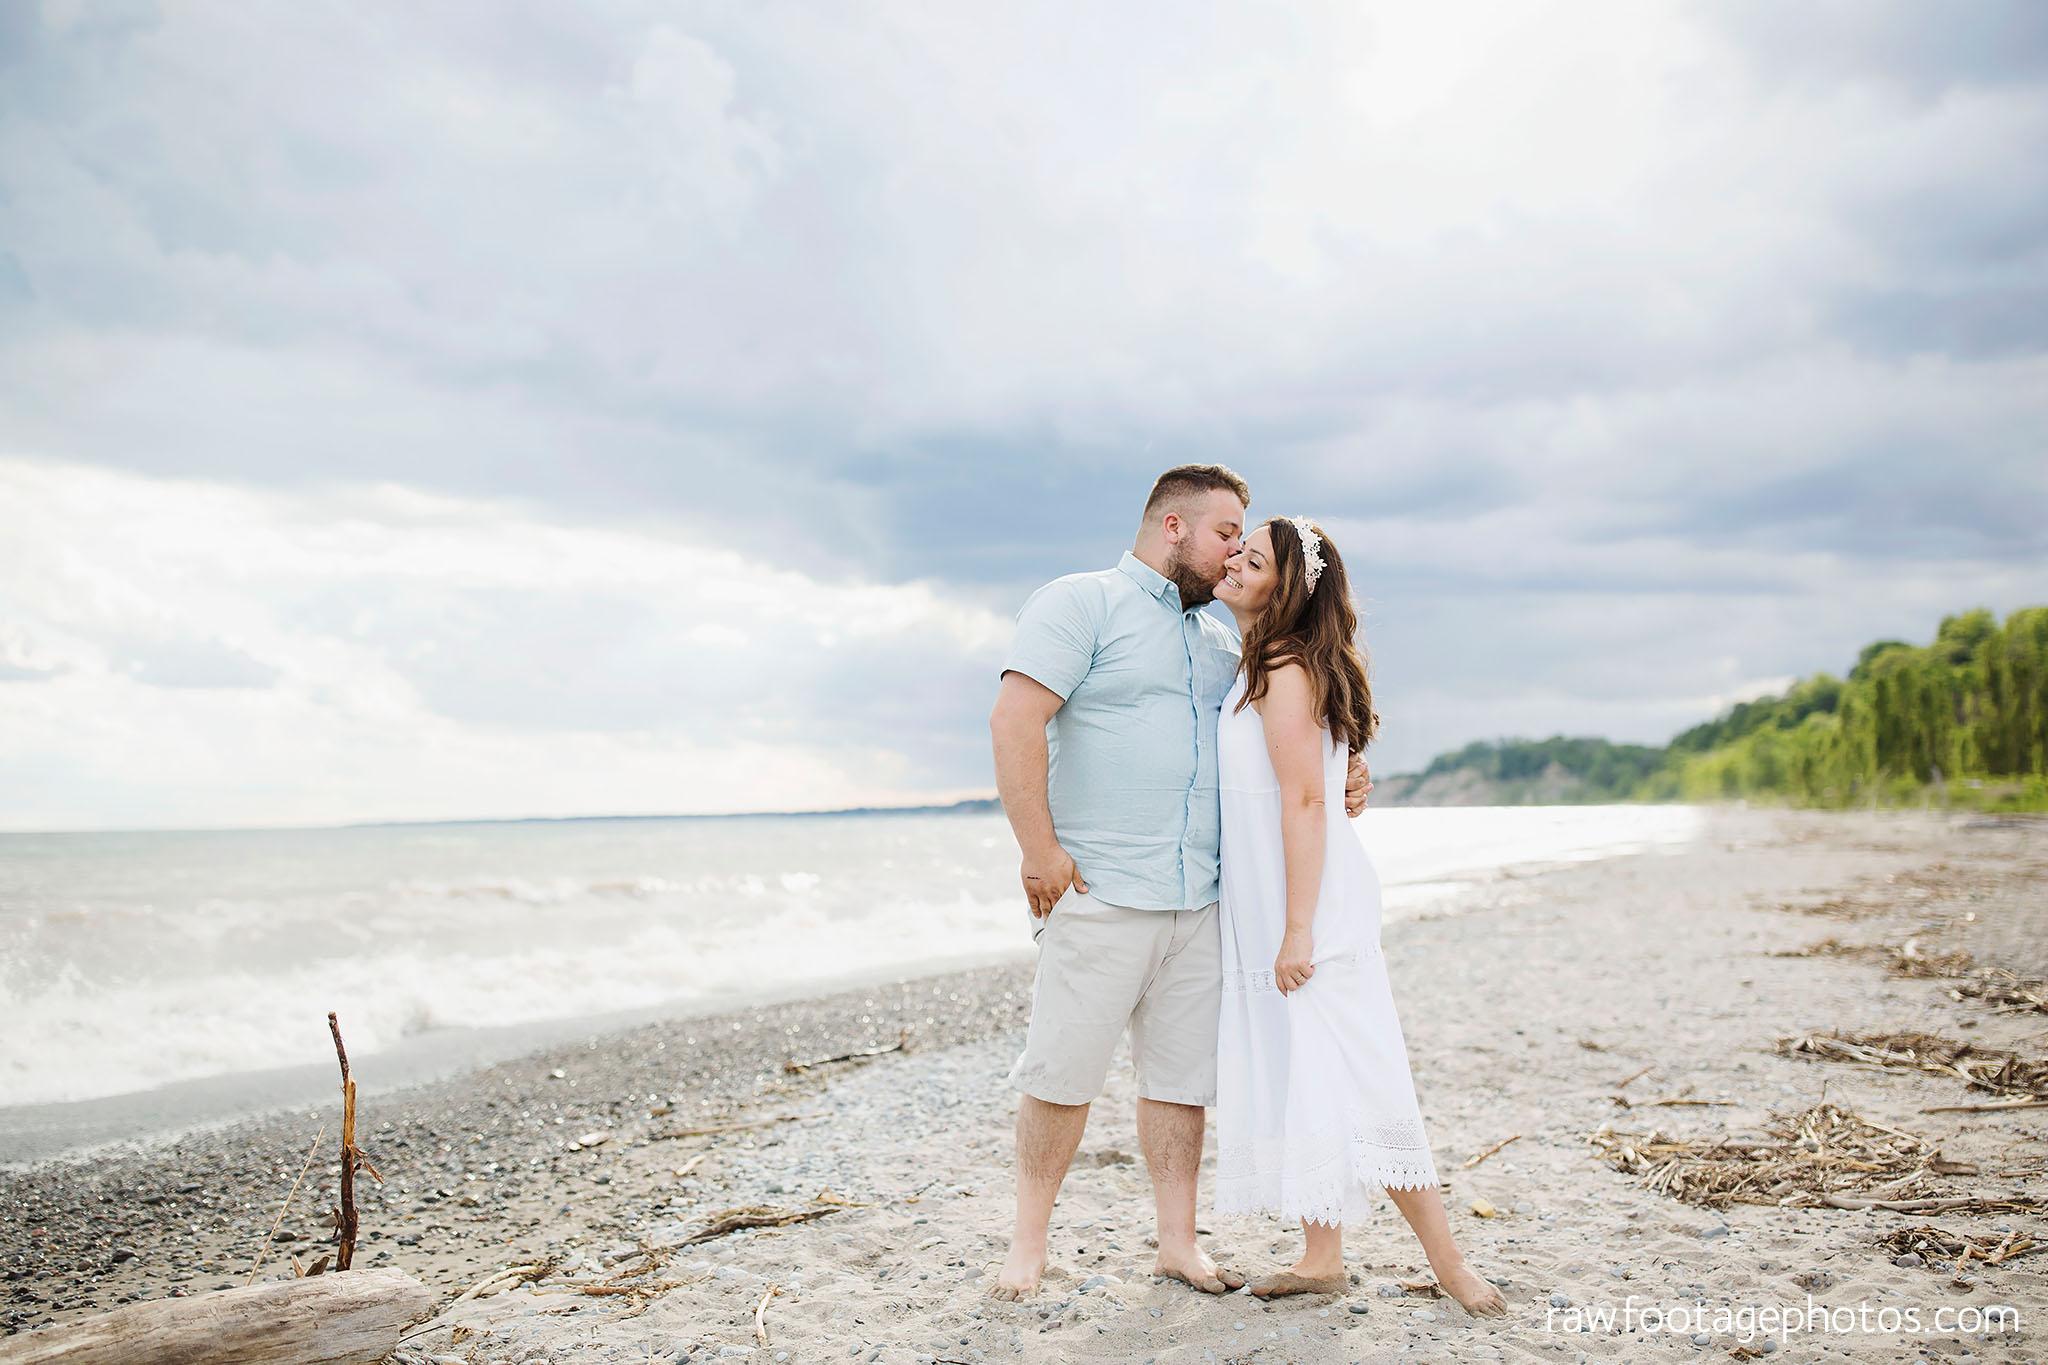 london_ontario_photographer-raw_footage_photography-beach_minis-port_stanley_beach-family_photographer-couple_photographer-lifestyle_photographer030.jpg